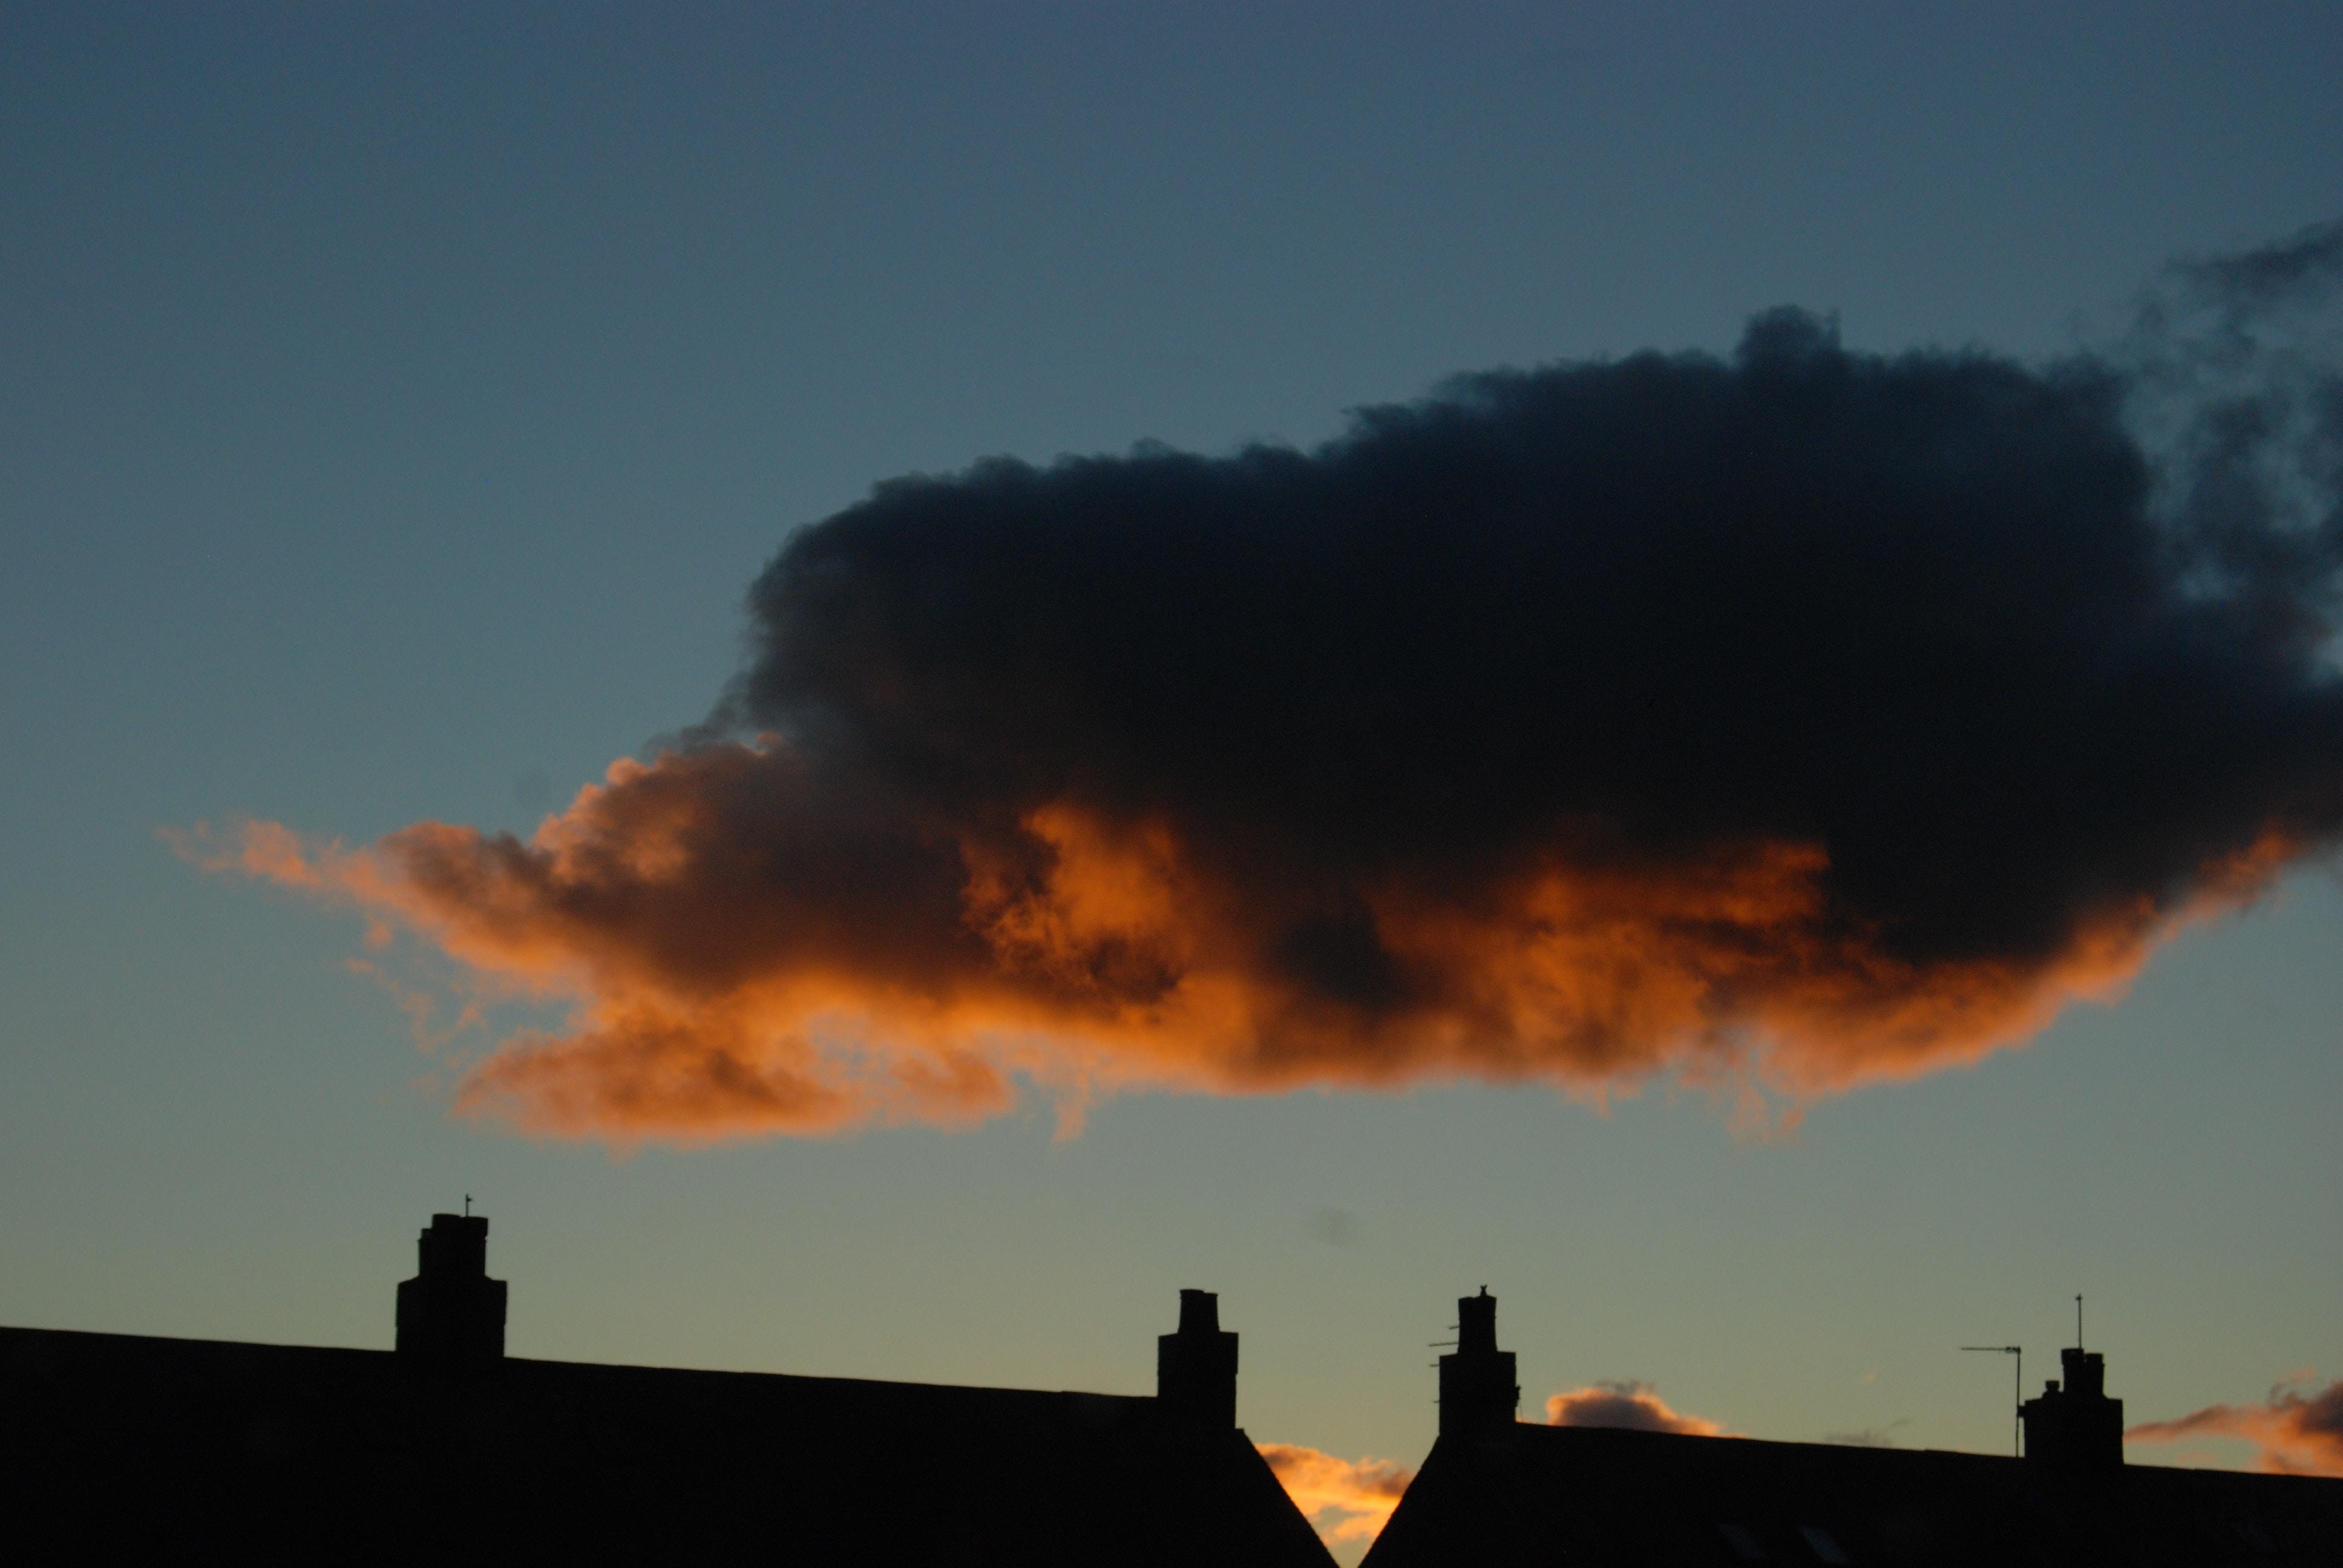 black clouds at daytime